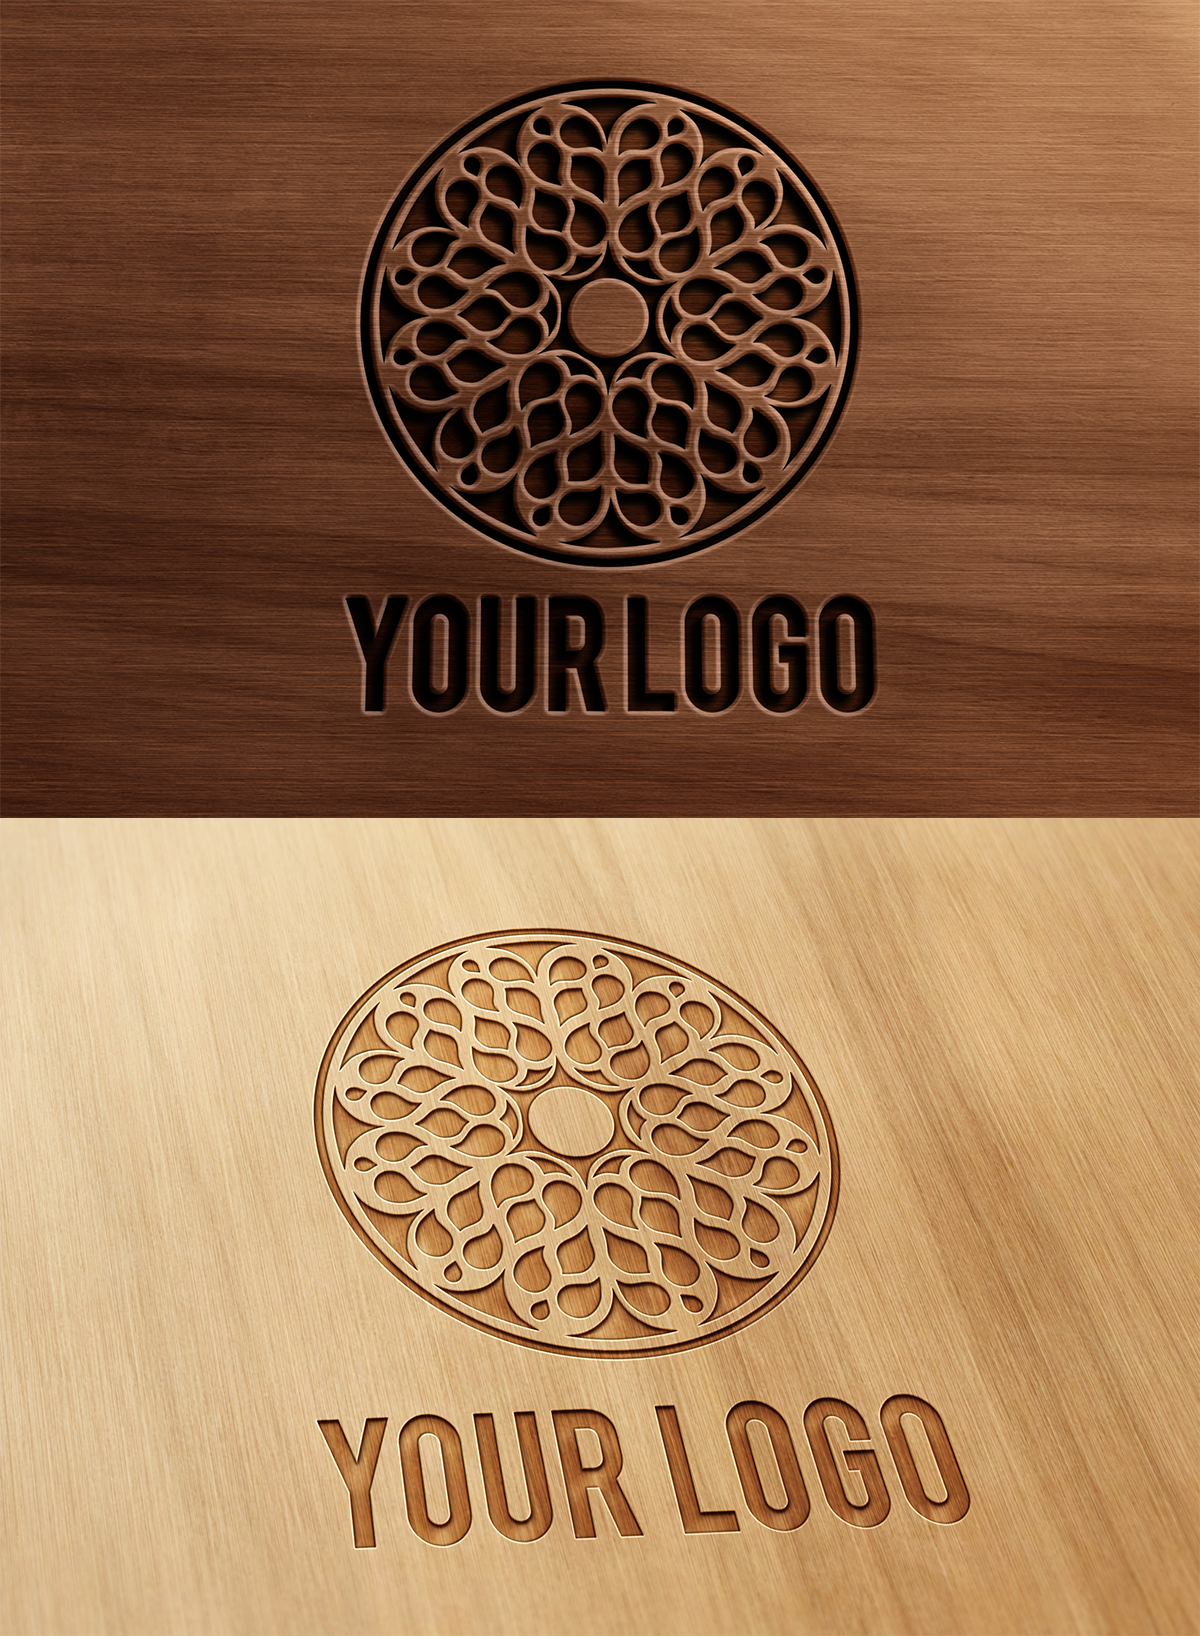 Carved And Pressed Wood Logo Mock Up By Wabbitns On Deviantart